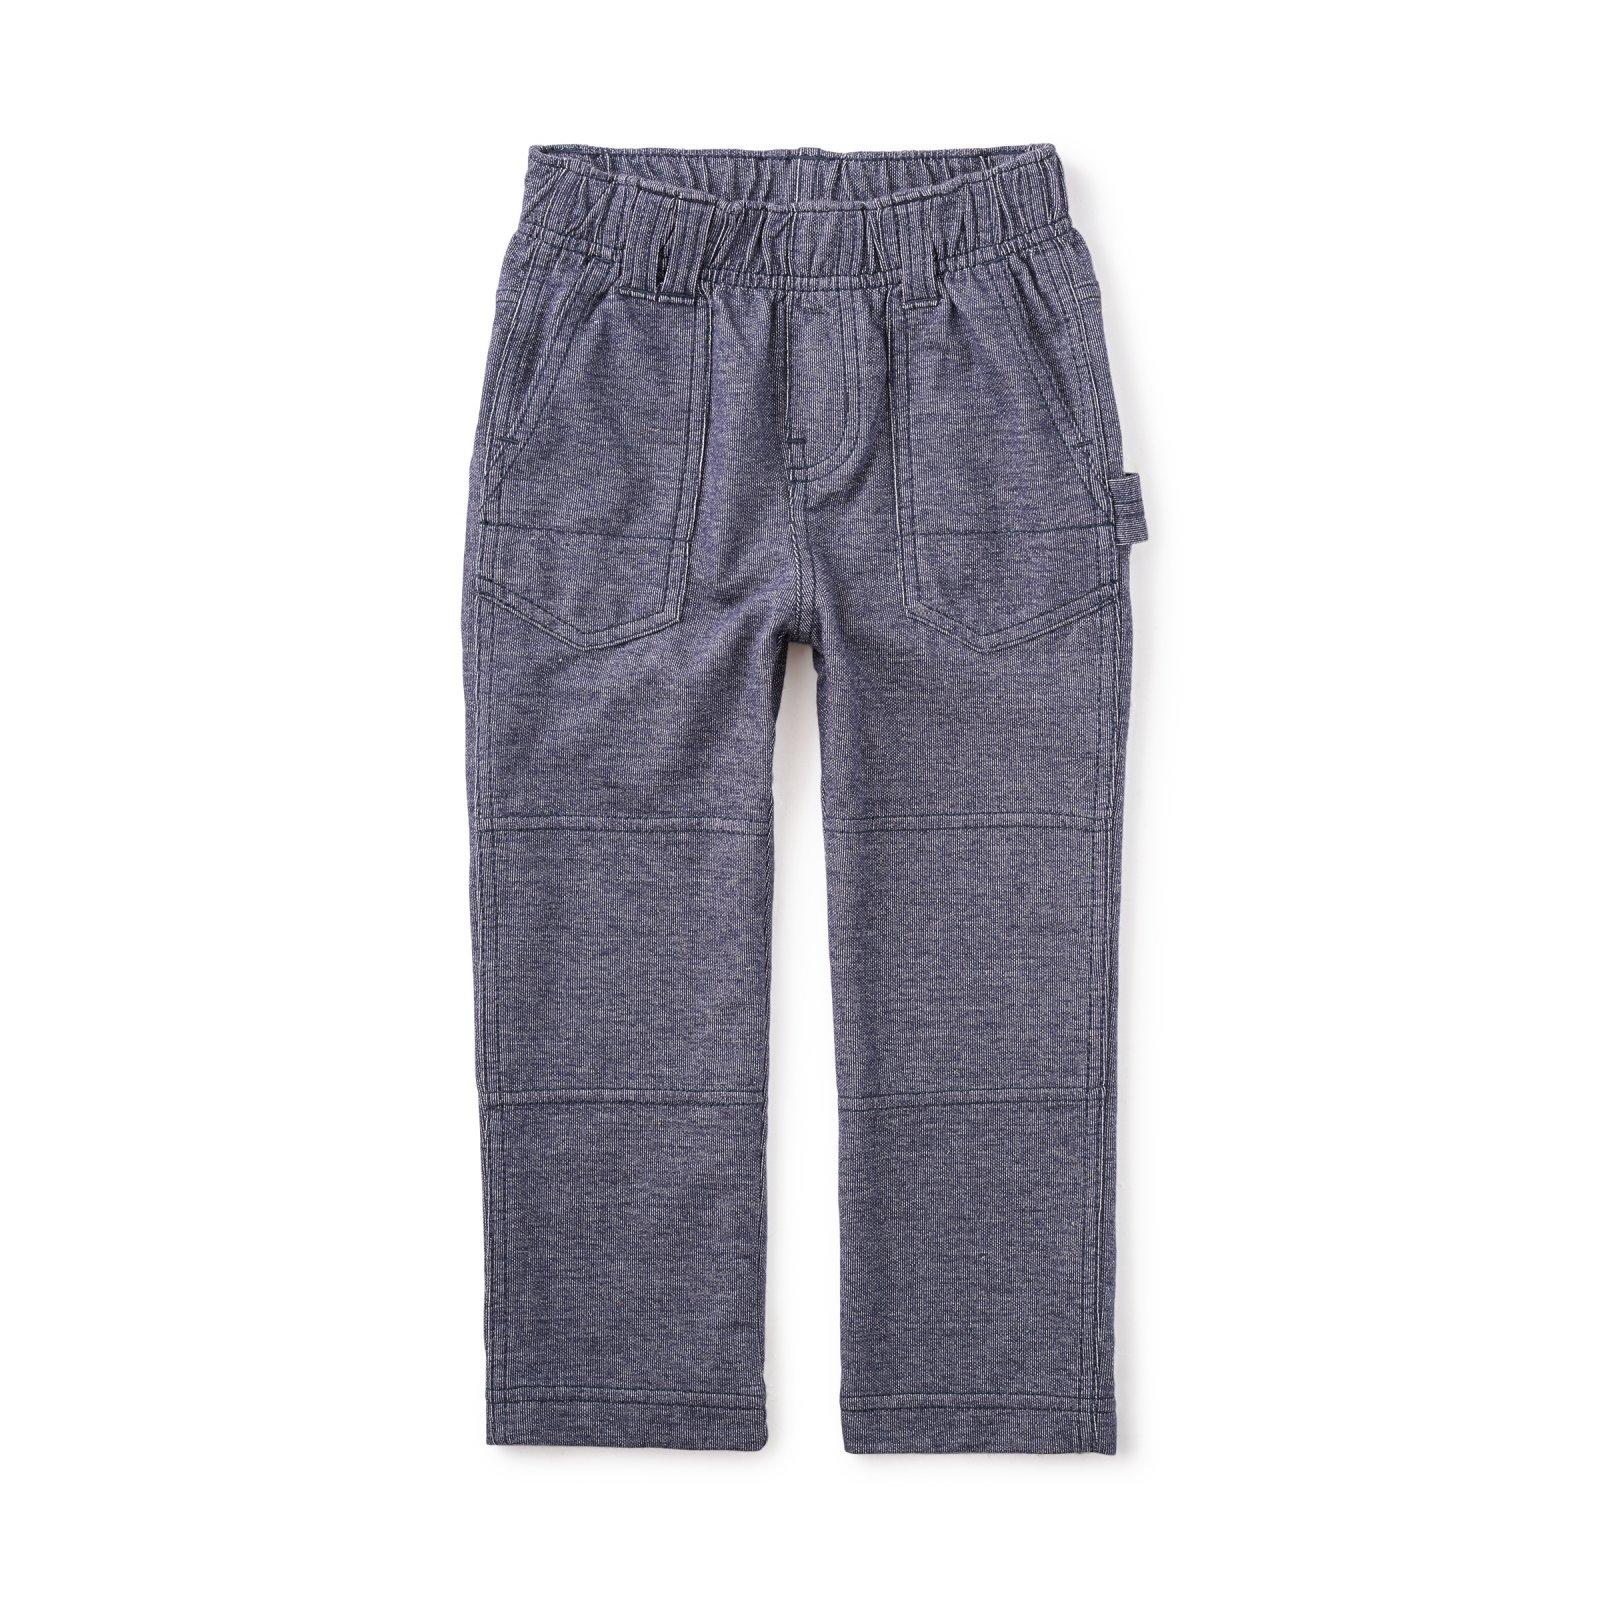 Boys Denim Like Playwear Pant